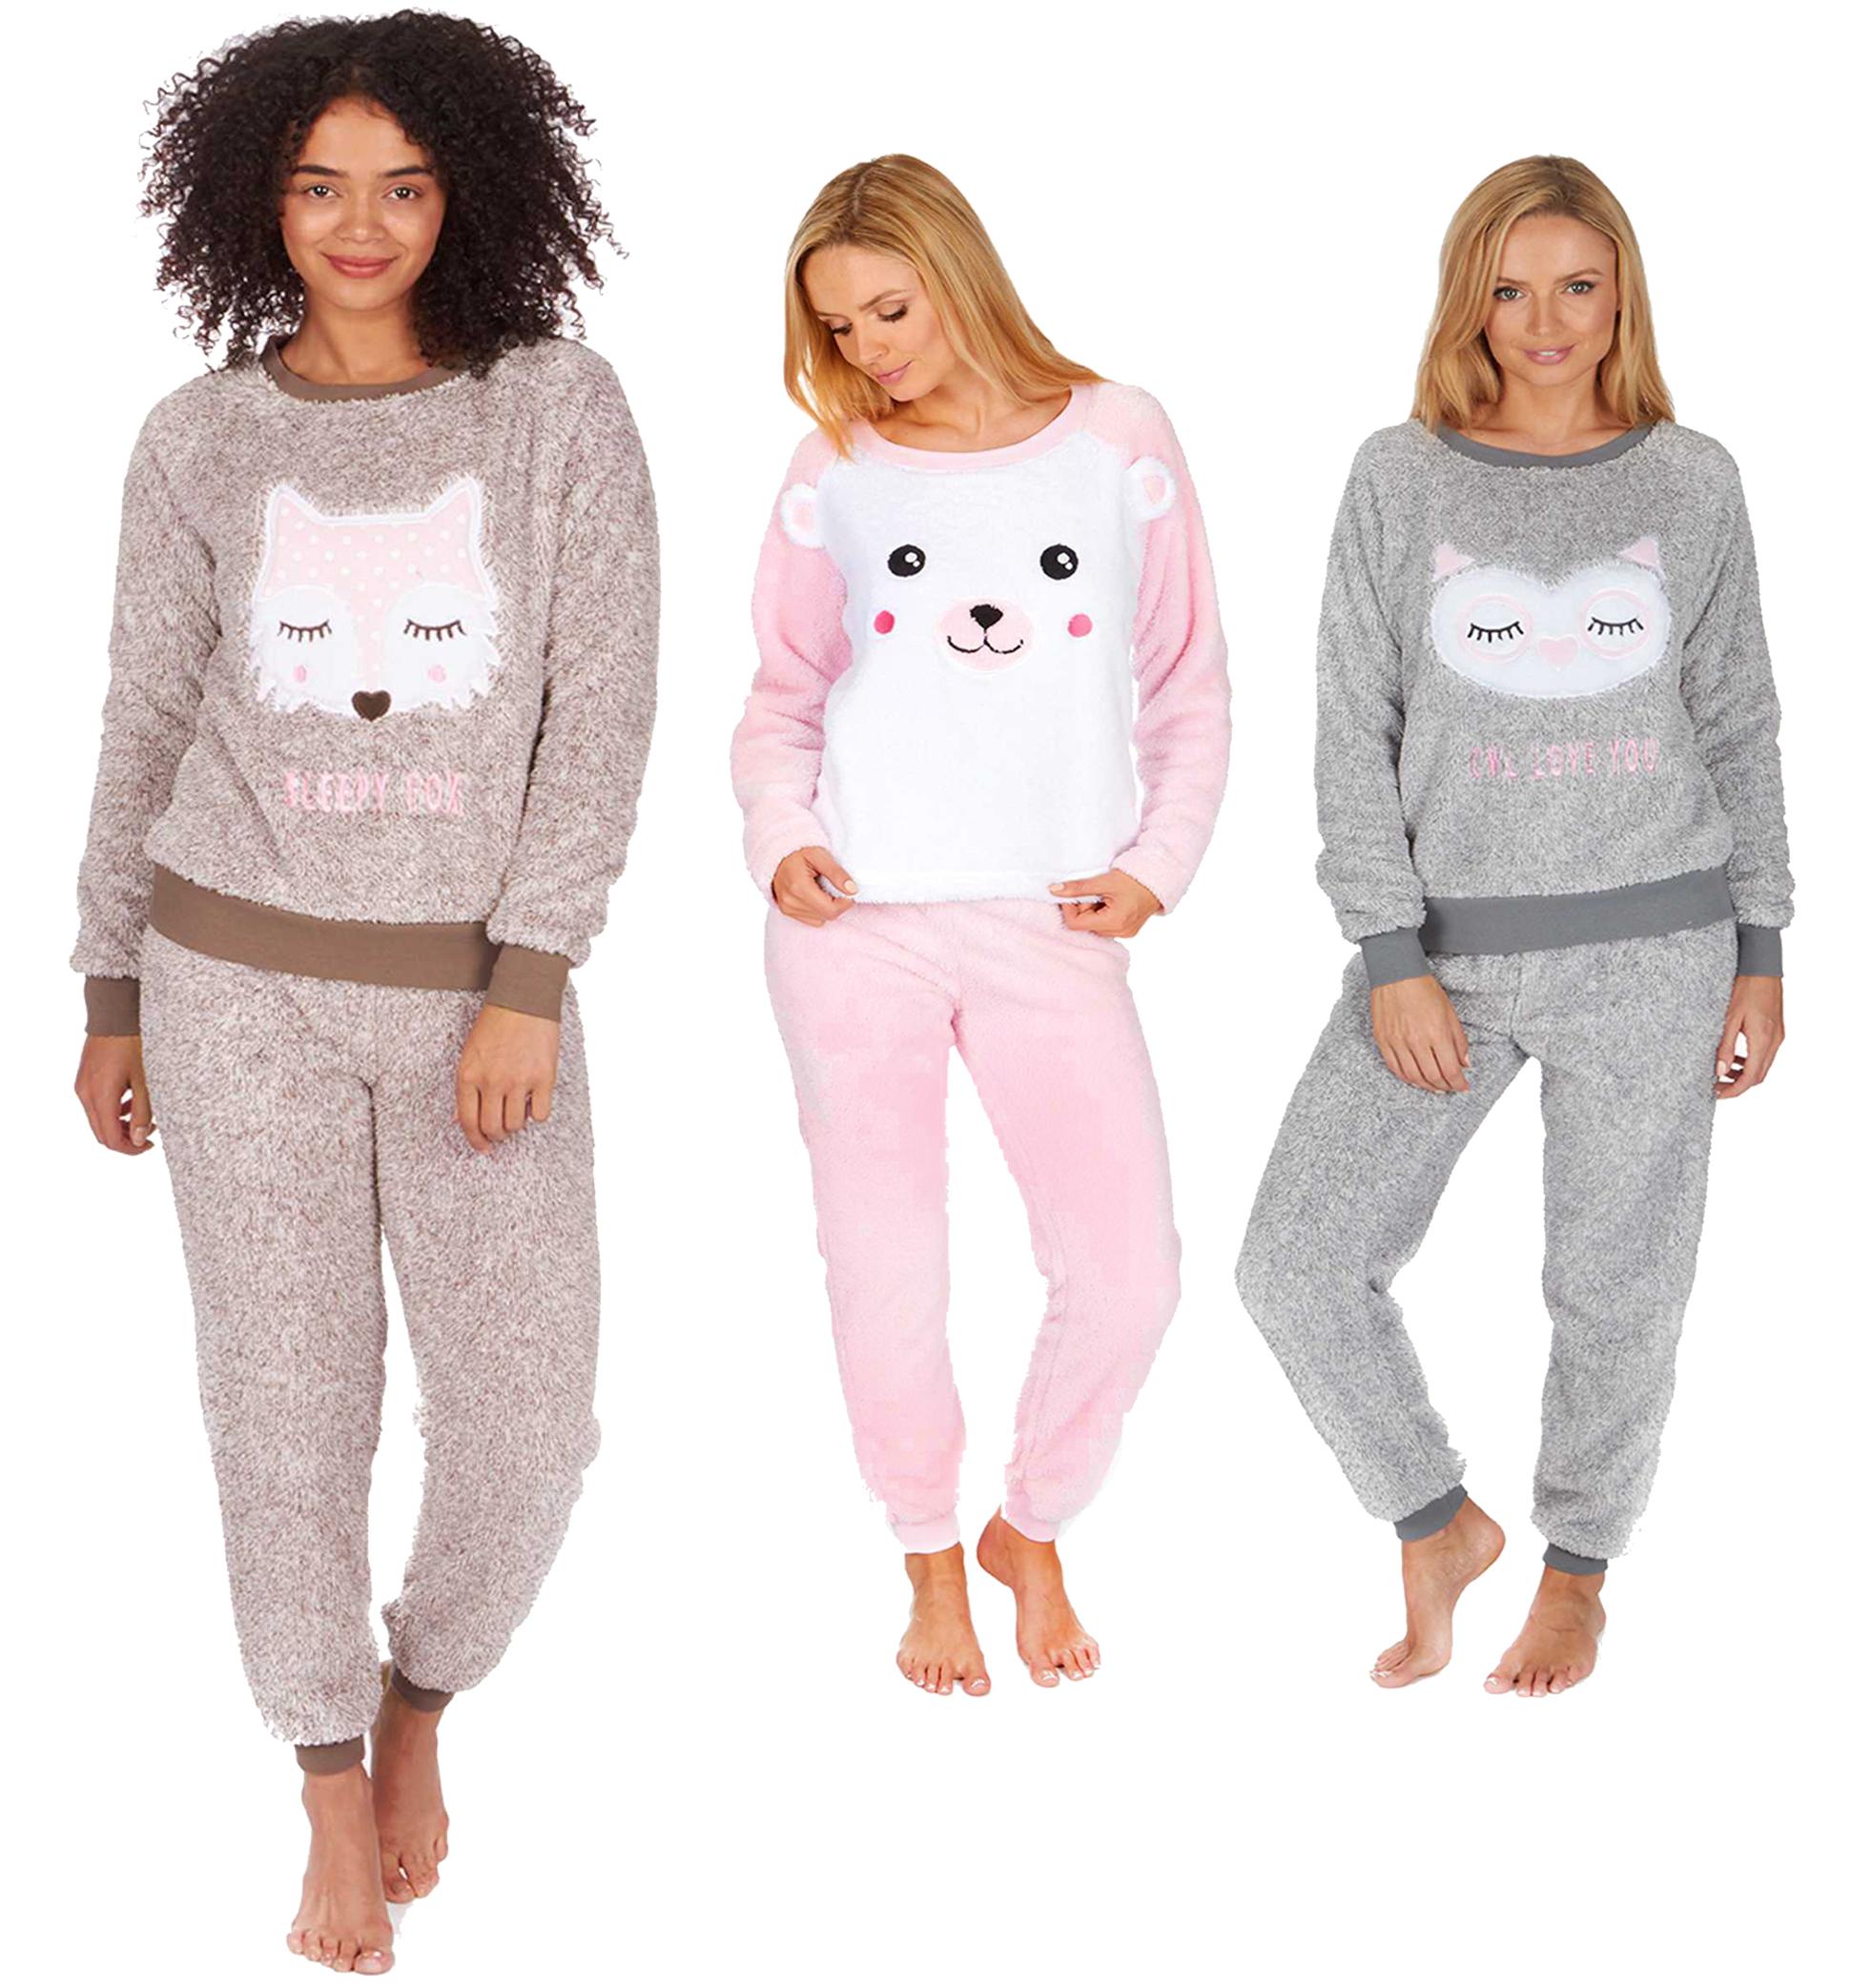 d8a6df29d Ladies Two Toned Snuggle Fleece Twosie Warm Winter PJ Pyjama Set ...